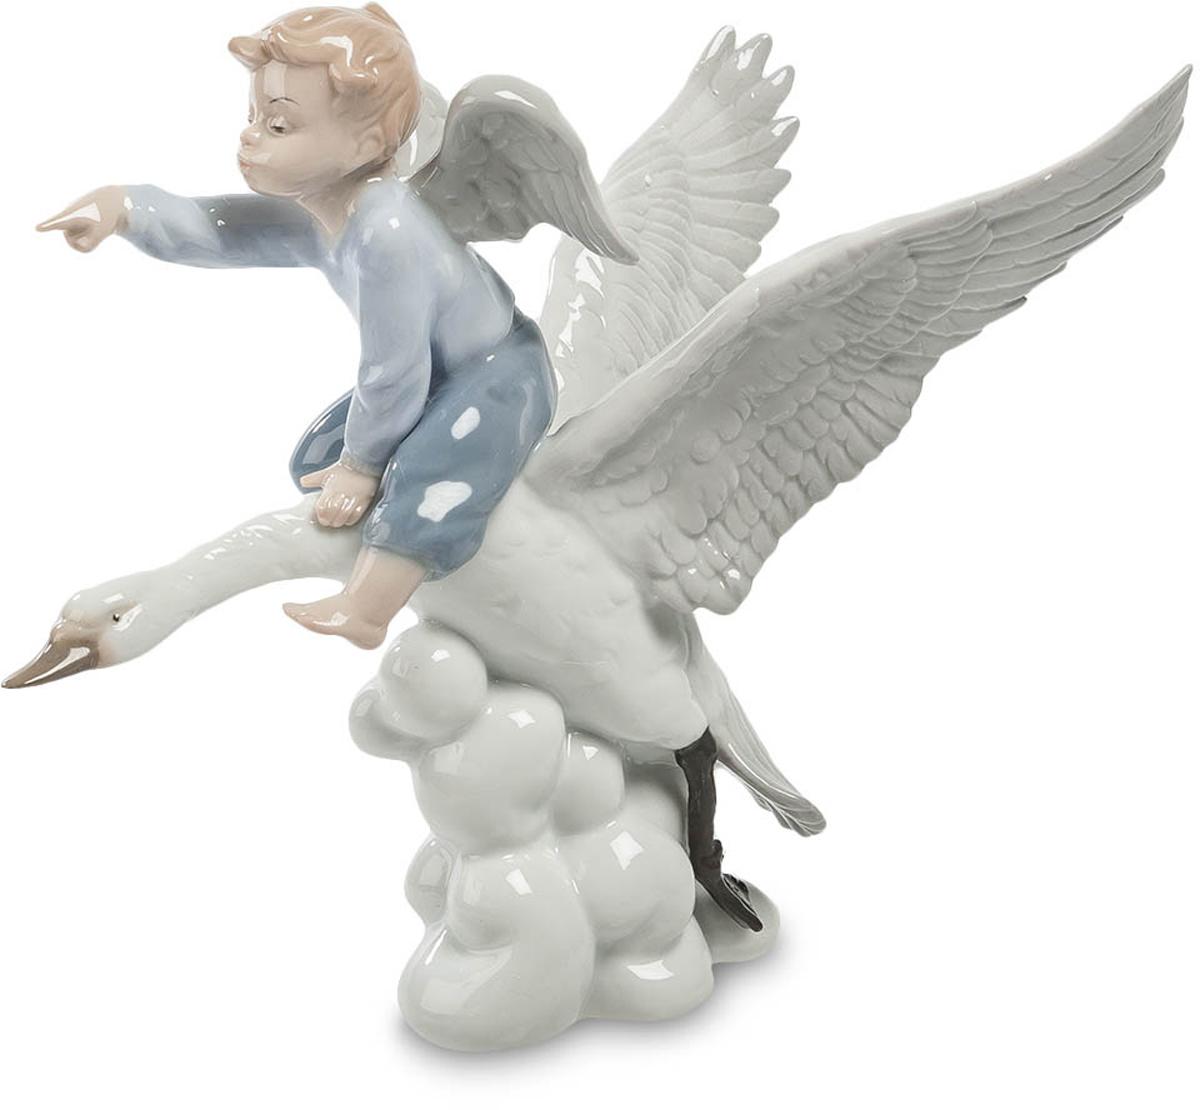 Фигурка Pavone Ангел. JP-22/ 2JP-22/ 2Фигурка Ангела высотой 19 см. Верхом на птице рассекает облака повелитель небес!